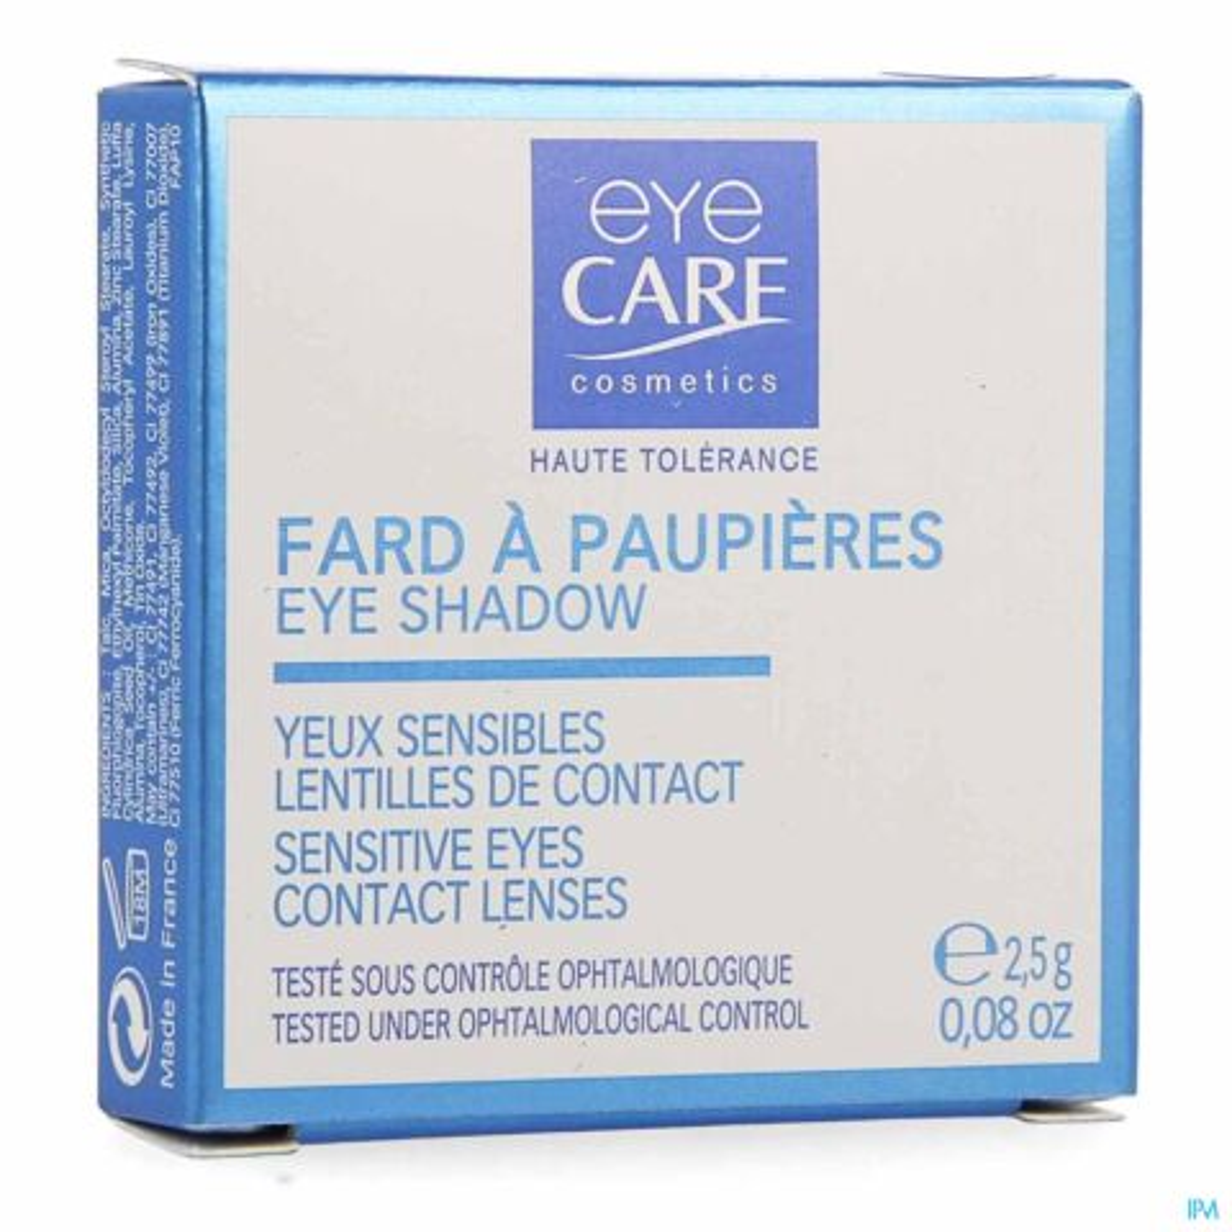 Eye Care Fard Paup. Marron Glace 2,5g 931